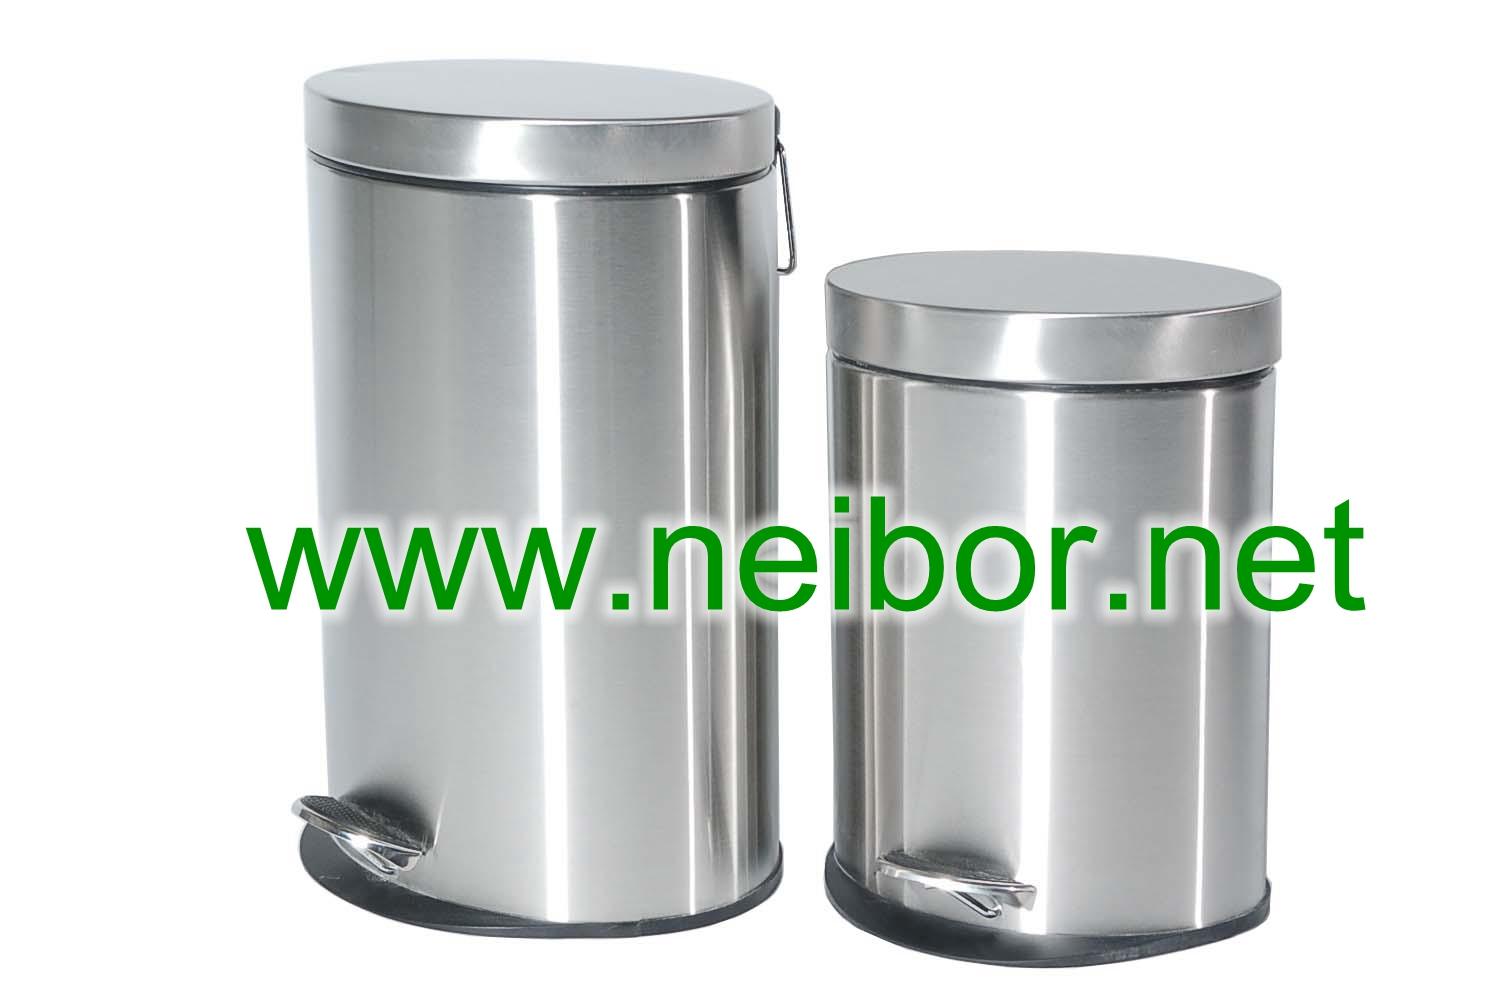 oval pedal bins,stainless steel pedal bins,waste bins